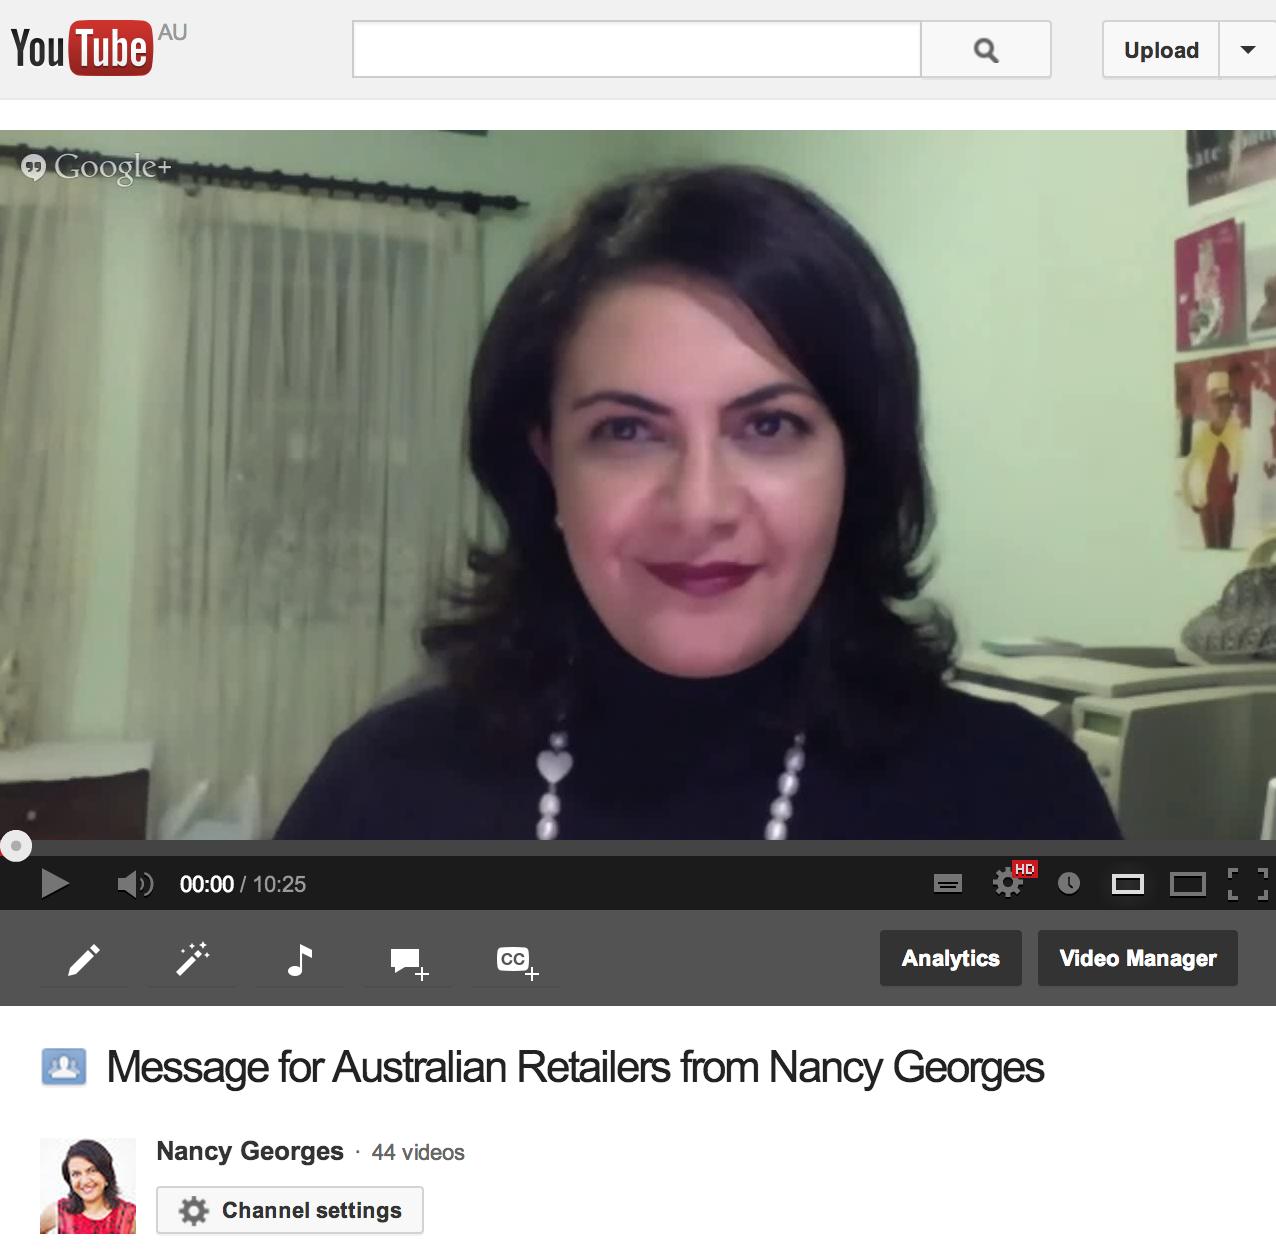 Nancy Georges Message to Australian Retailers